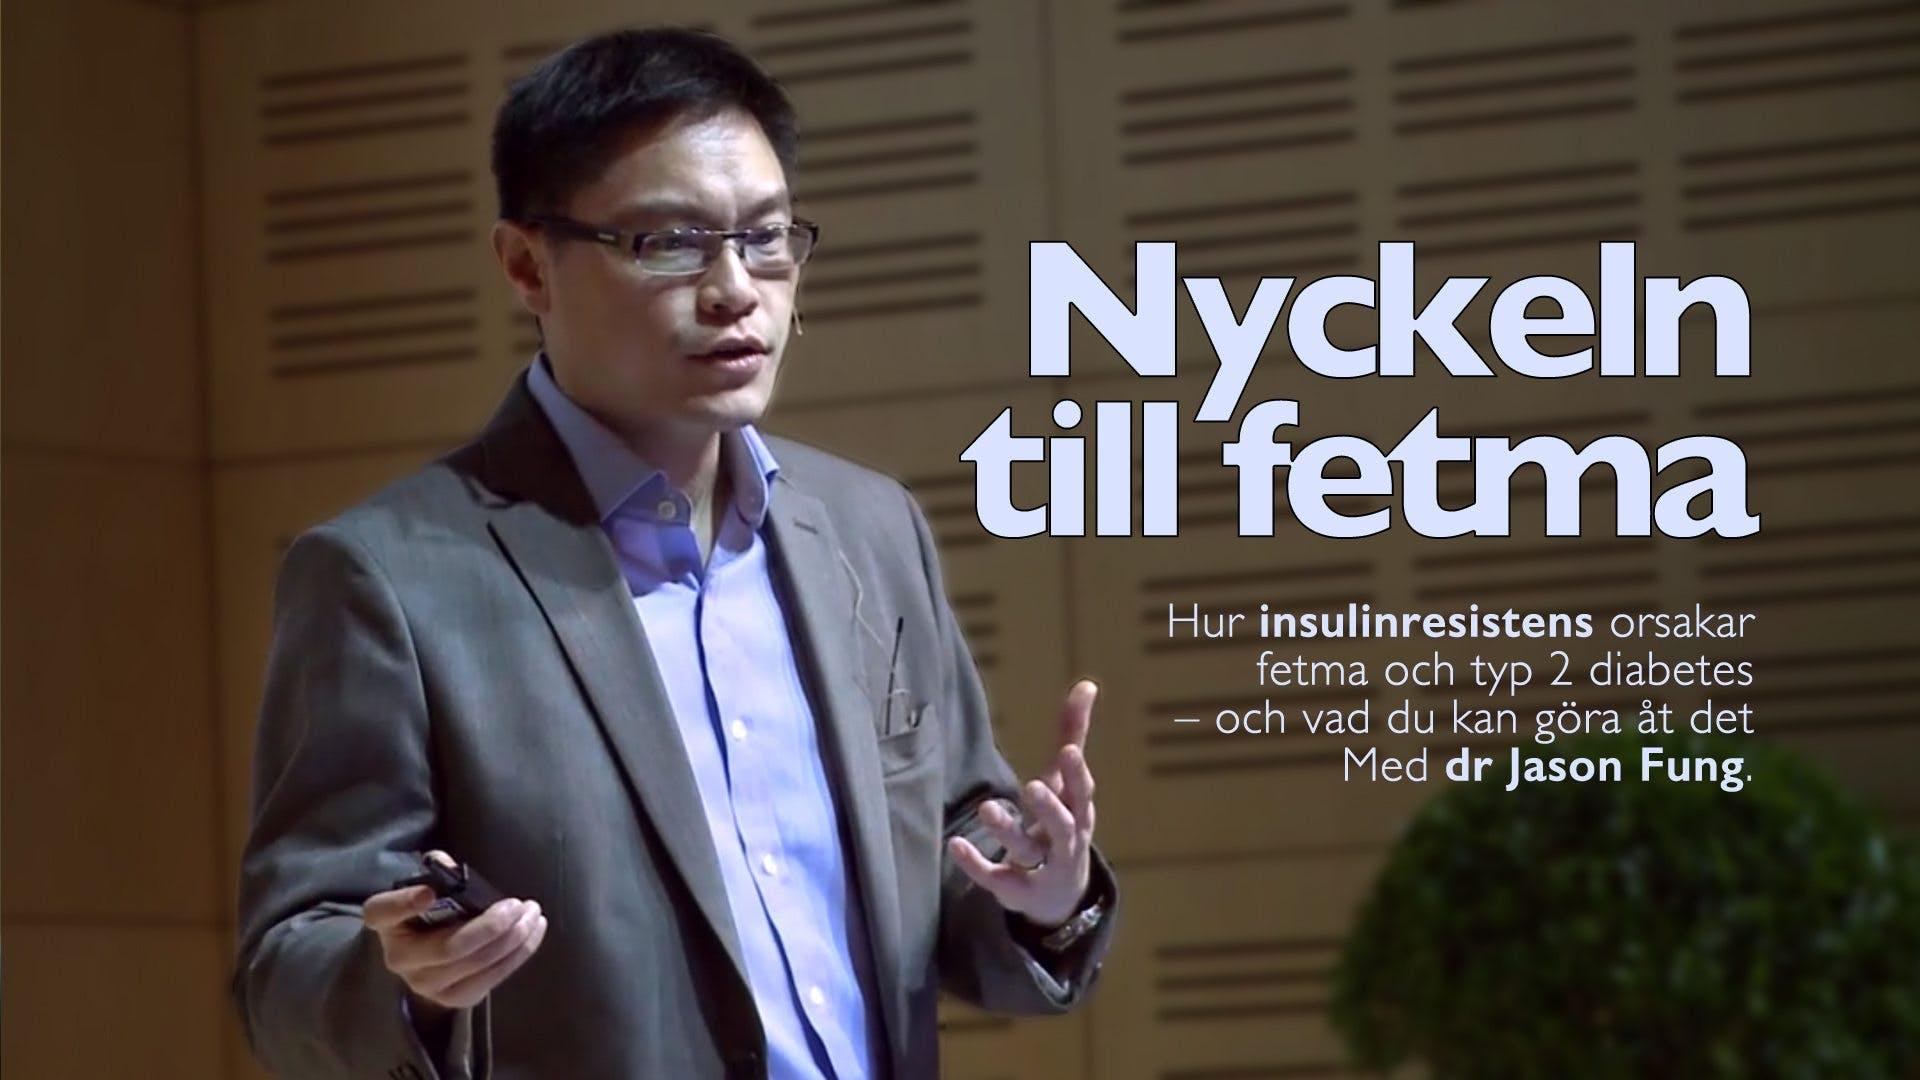 Nyckeln till fetma – Dr Jason Fung